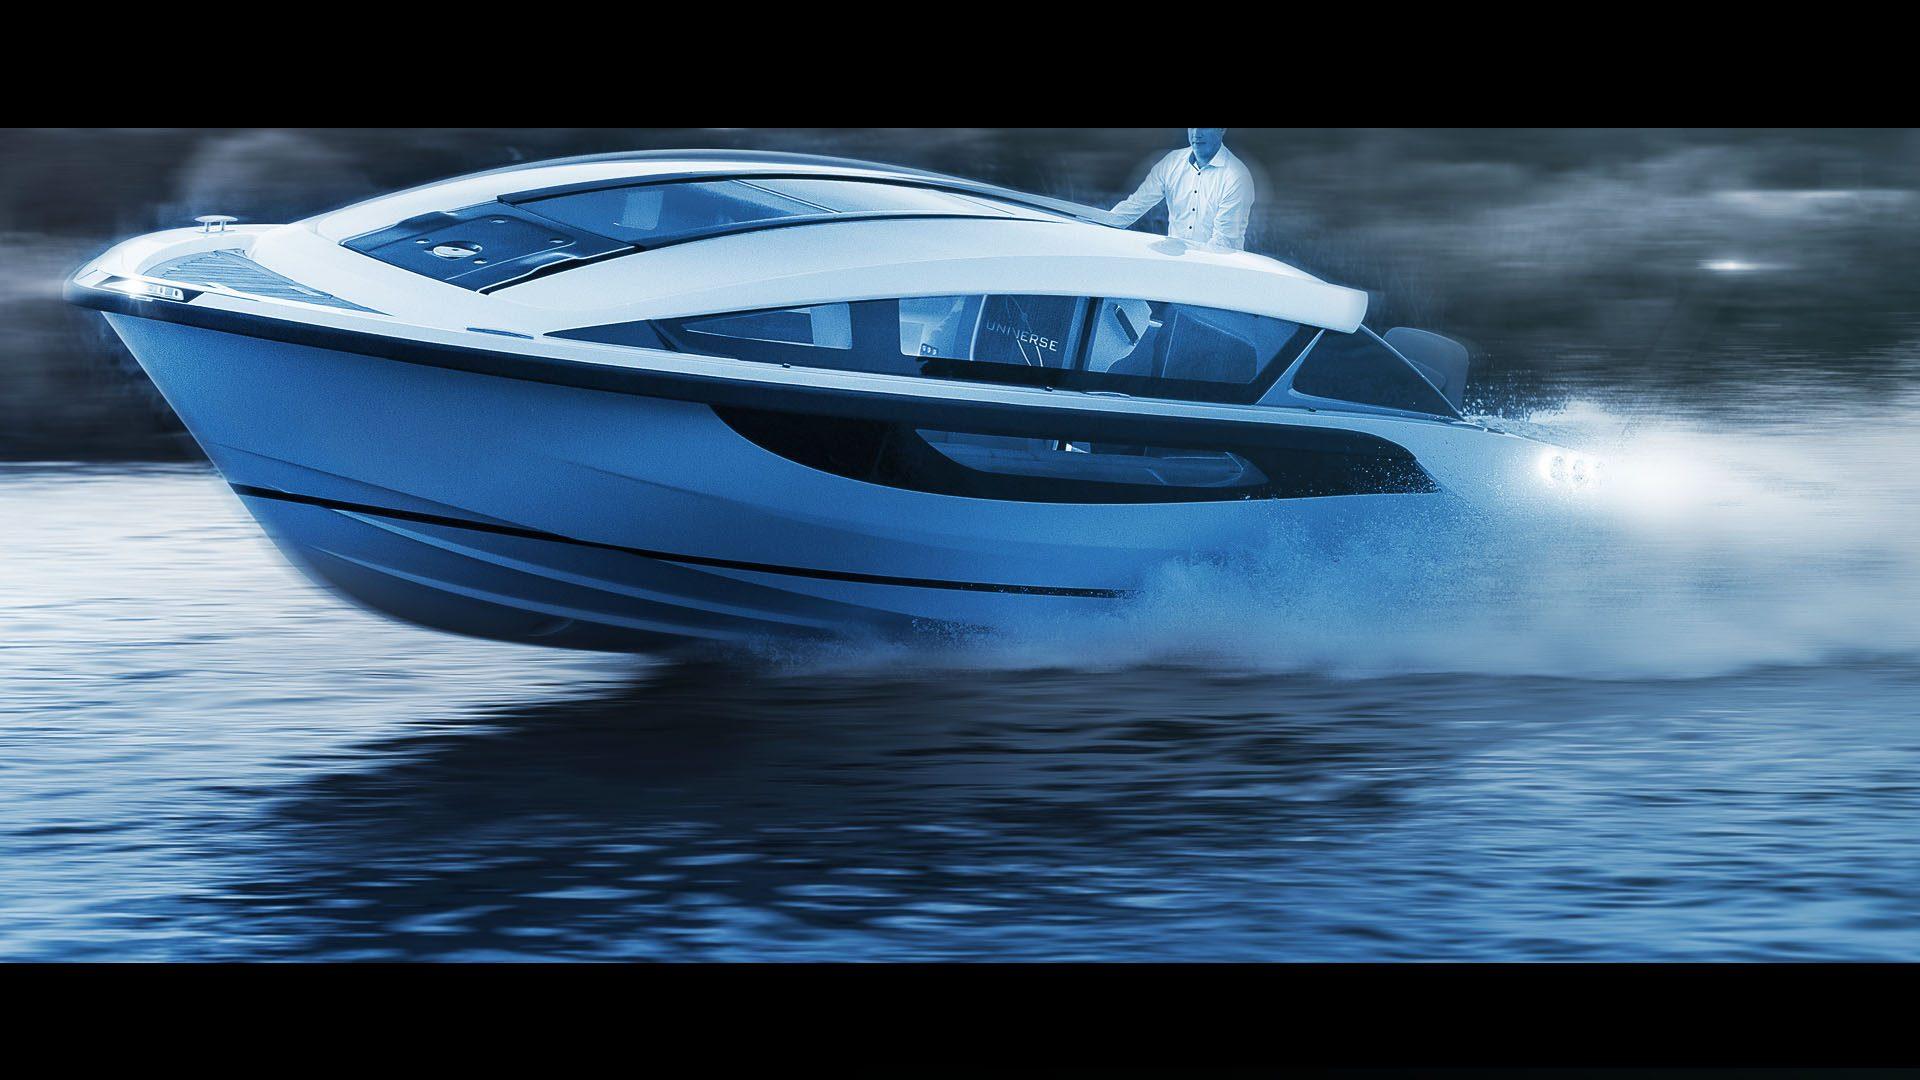 Limousine Tender Boat for Superyachts, designed by Hamid Bekradi